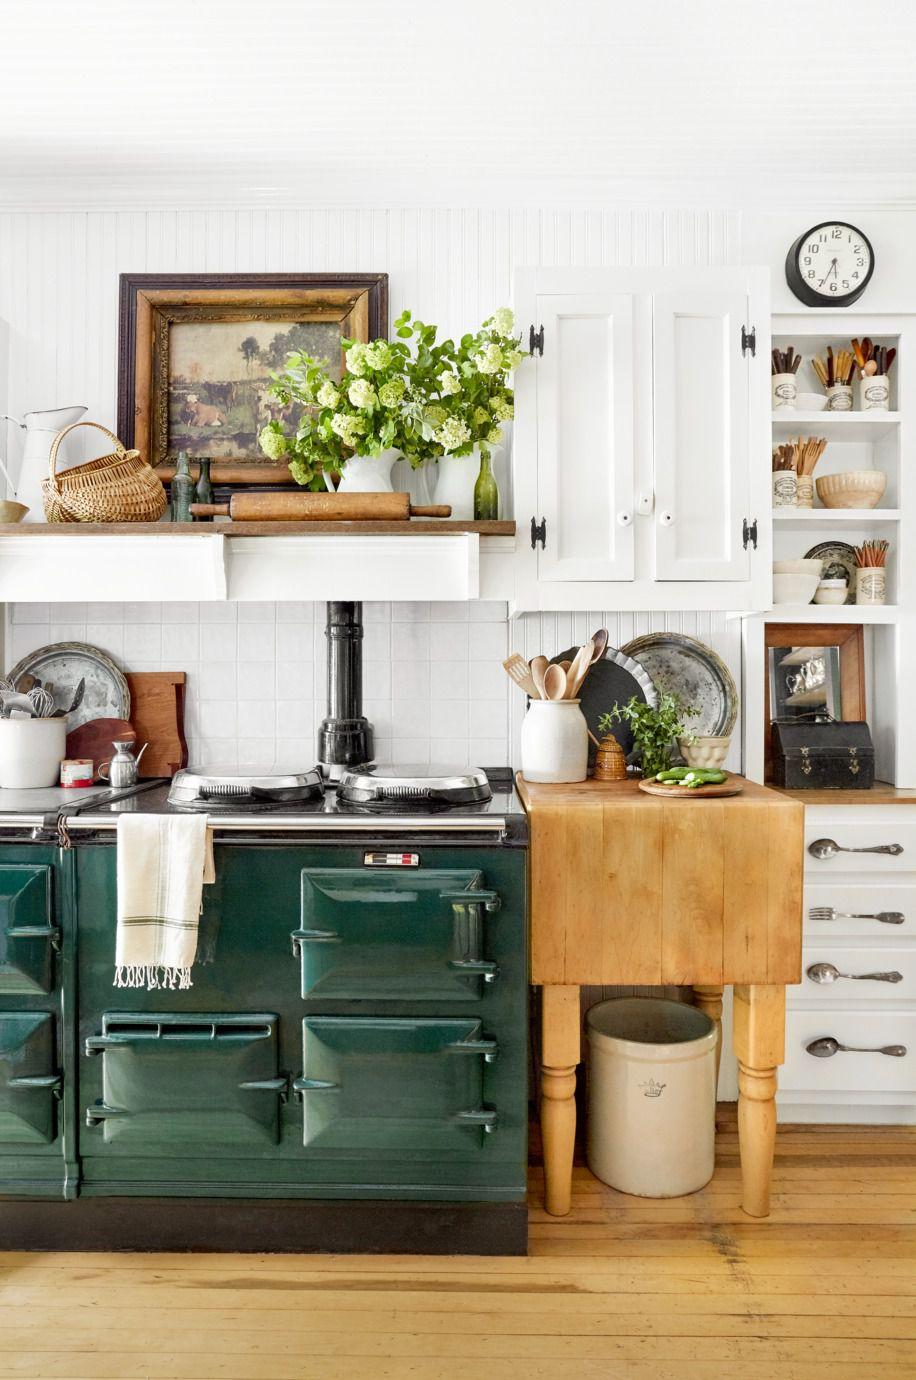 50+ Best Farmhouse Style Ideas - Rustic Home Decor